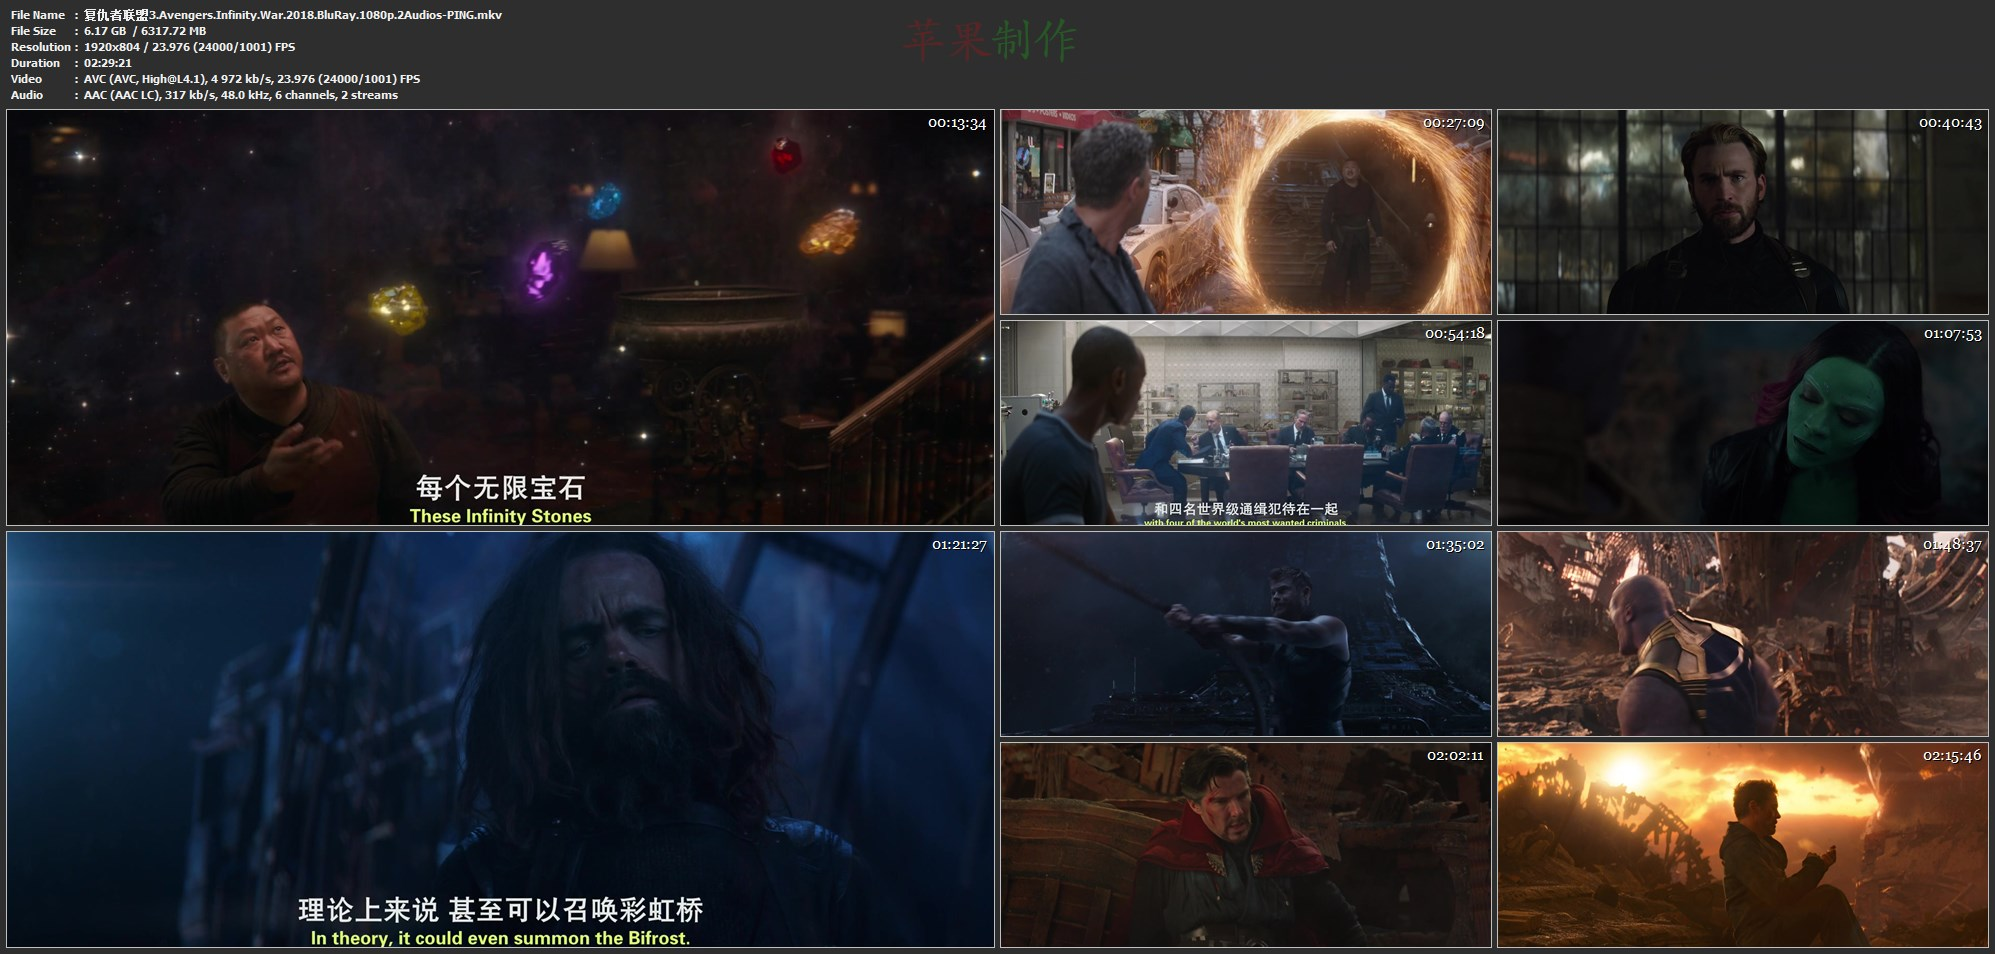 复仇者联盟3.Avengers.Infinity.War.2018.BluRay.1080p.2Audios-PING.mkv.jpg